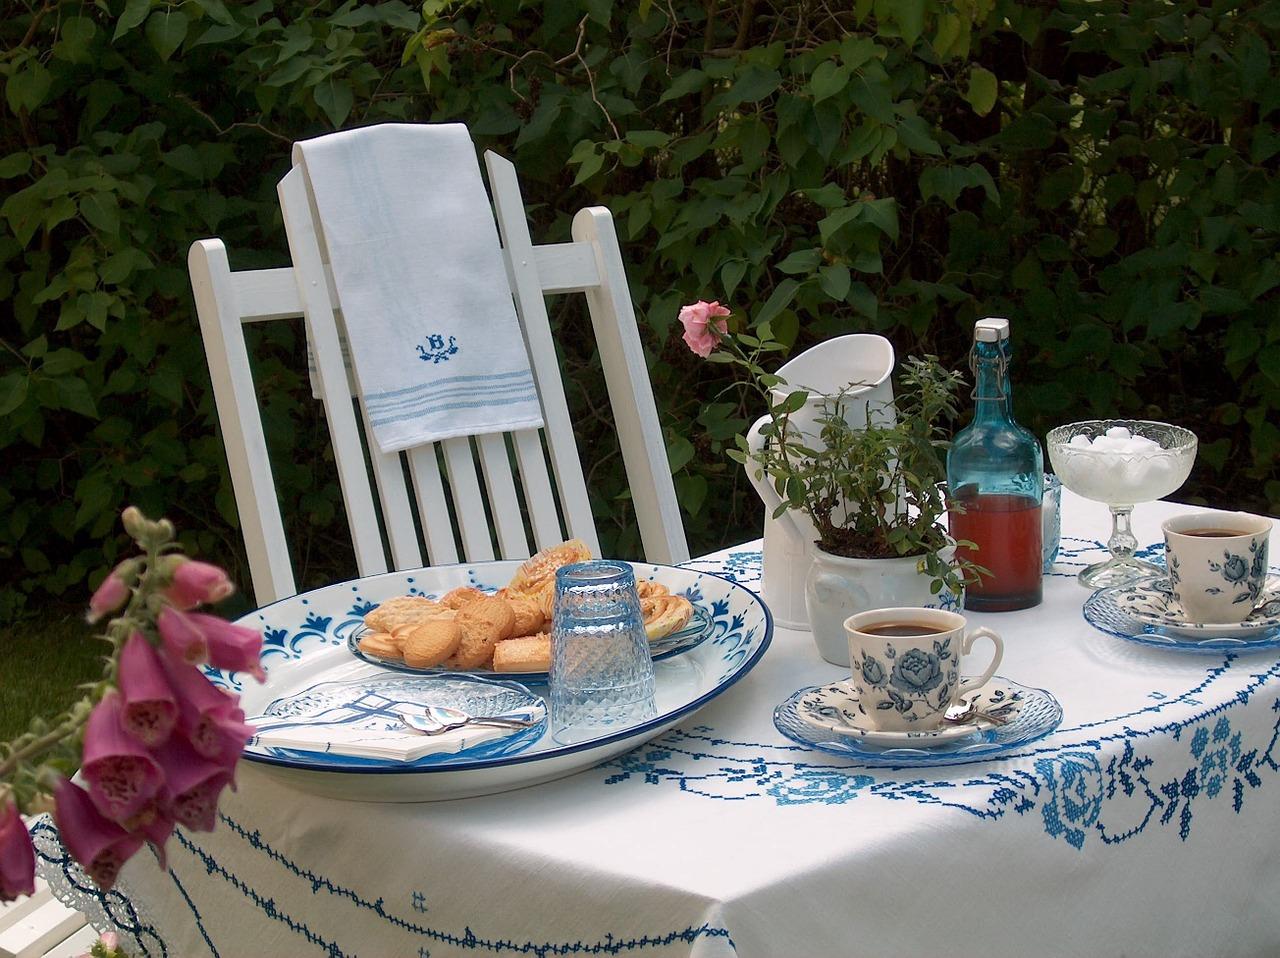 Garten Gartentisch Kaffee Gebäck Kuchen gedeckter Tisch